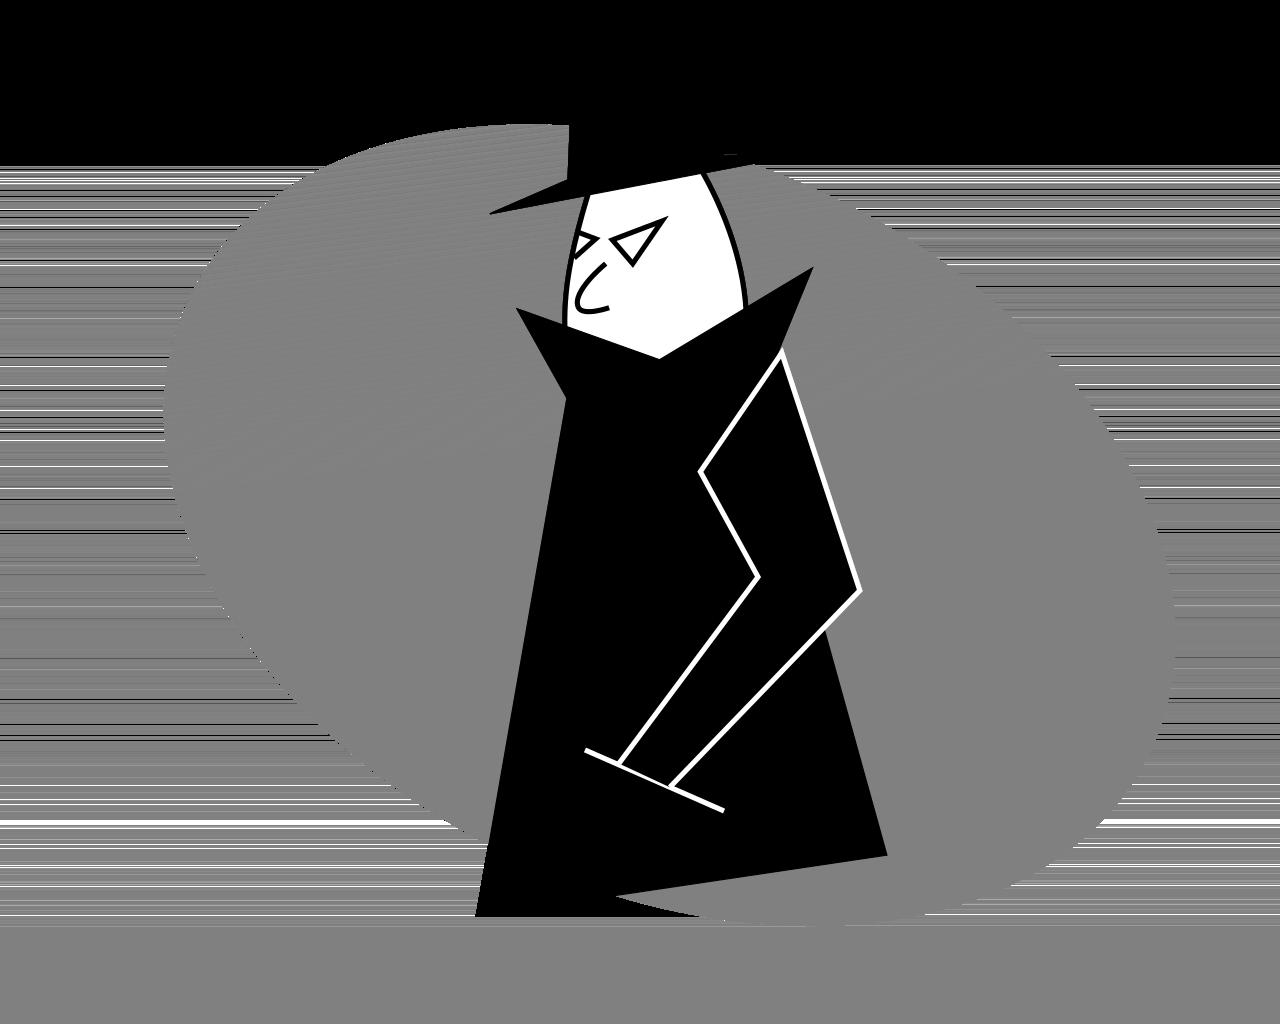 3xploits svg #3, Download drawings